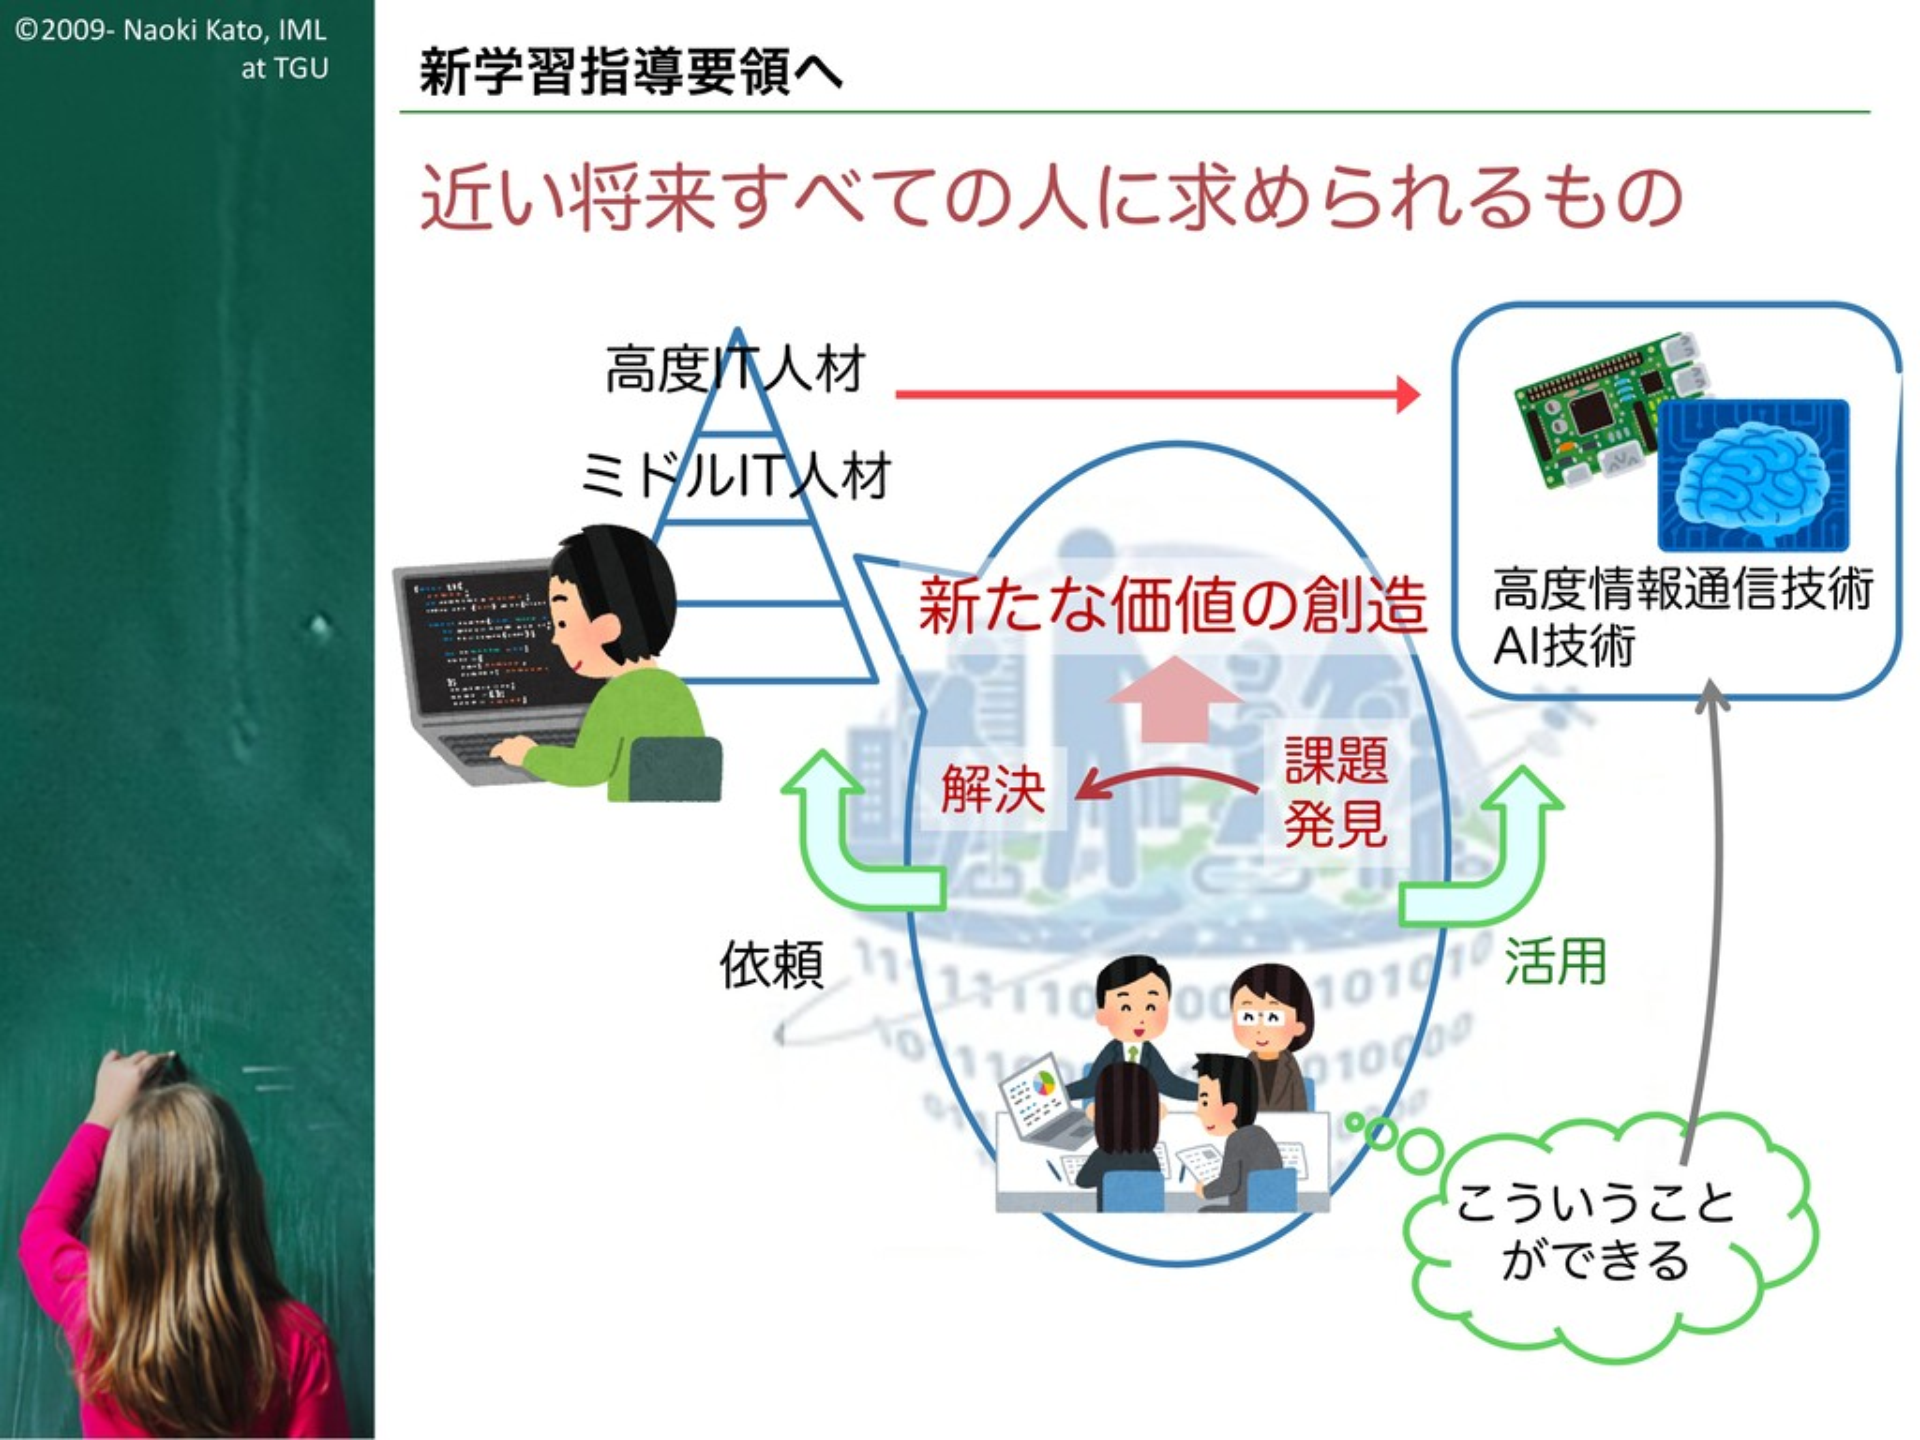 ©2009- Naoki Kato, IML at TGU 新学習指導要領へ 近い将来すべての...